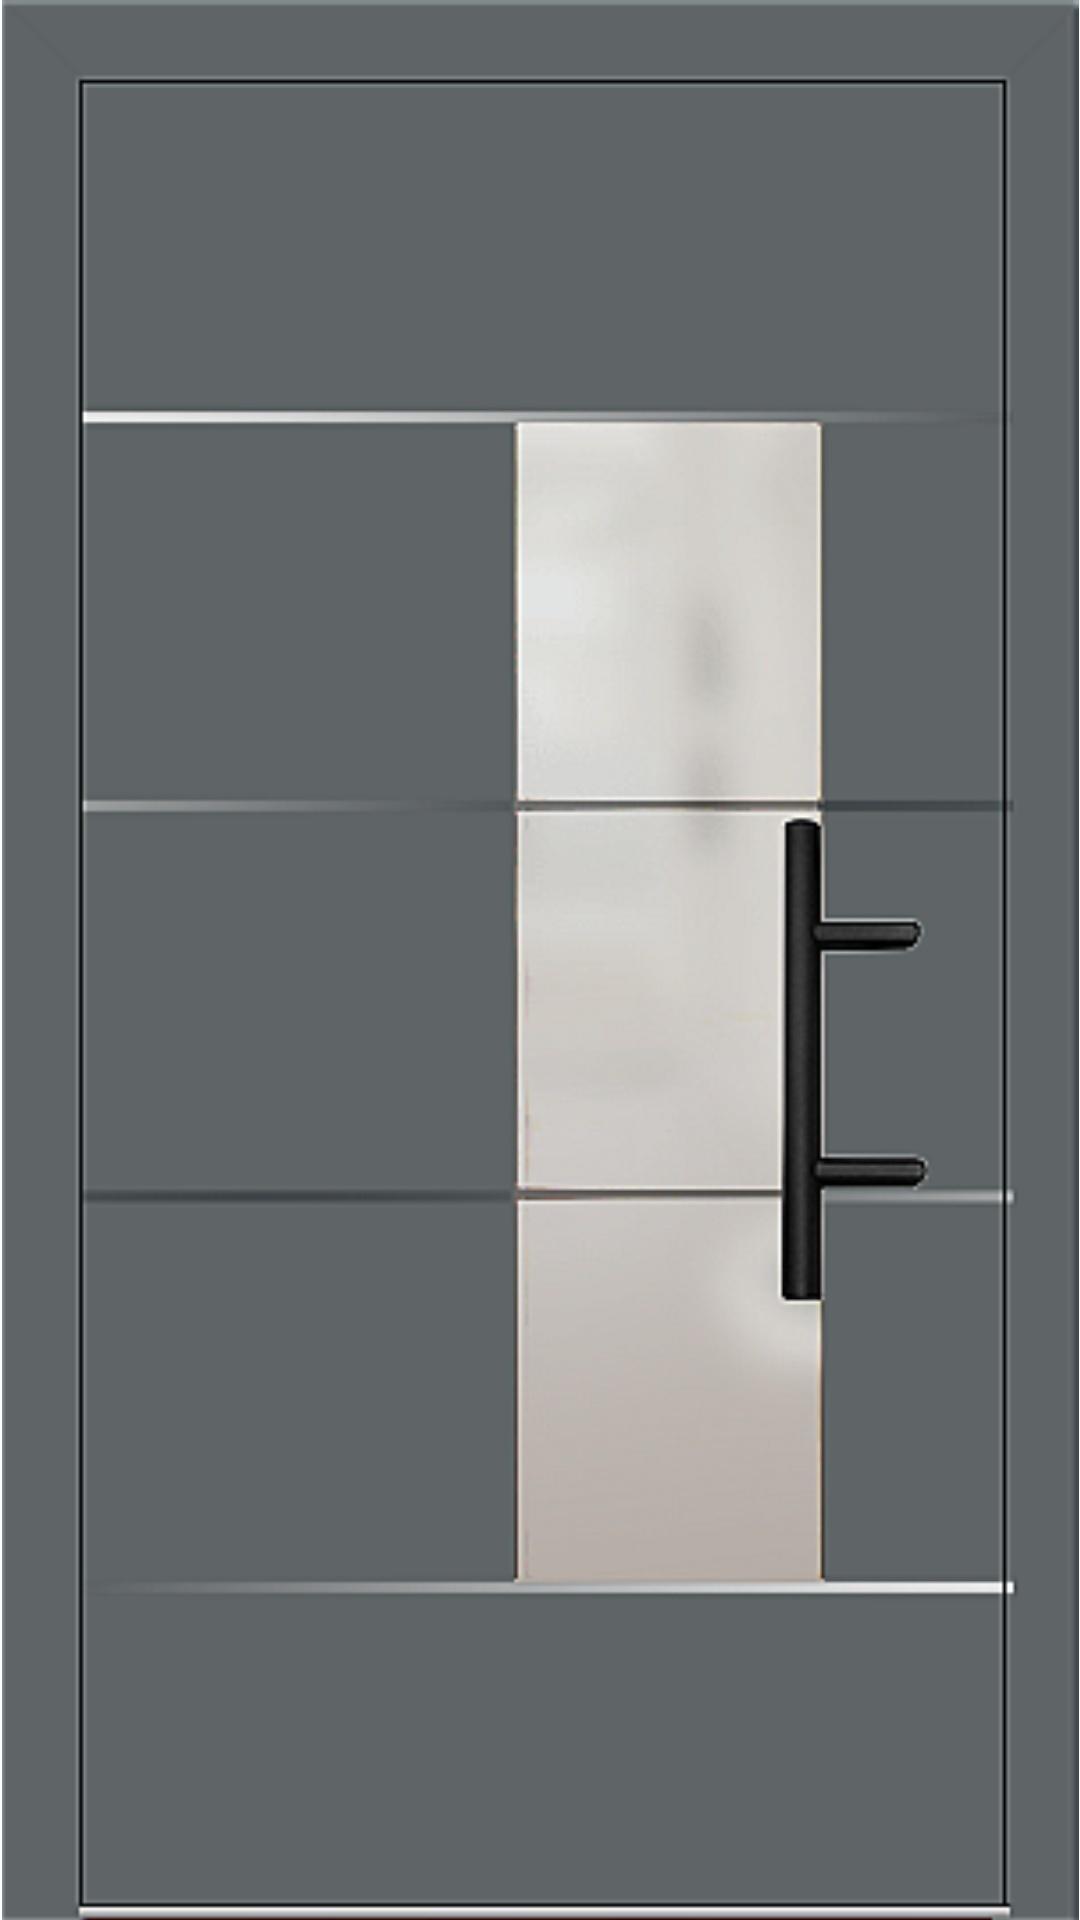 Holz-Alu Haustür Modell 66878 basaltgrau